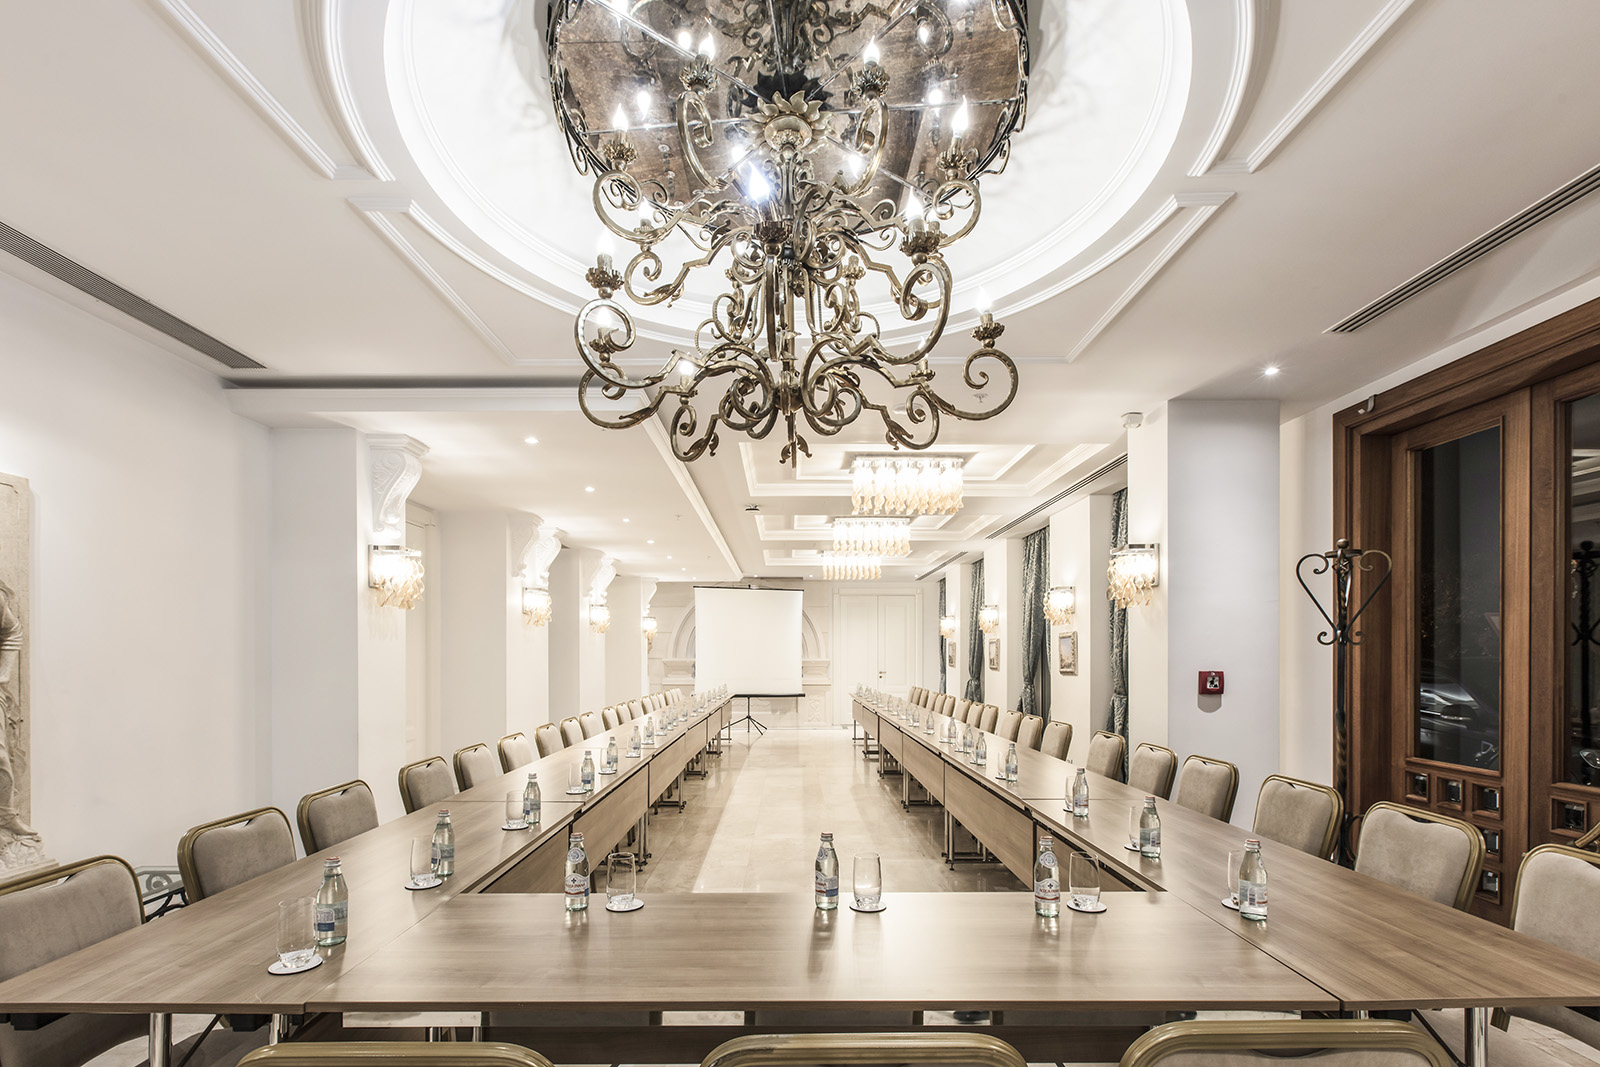 Cruciform Foyer Seminar Room : Foyer room xheko imperial hotel tirana